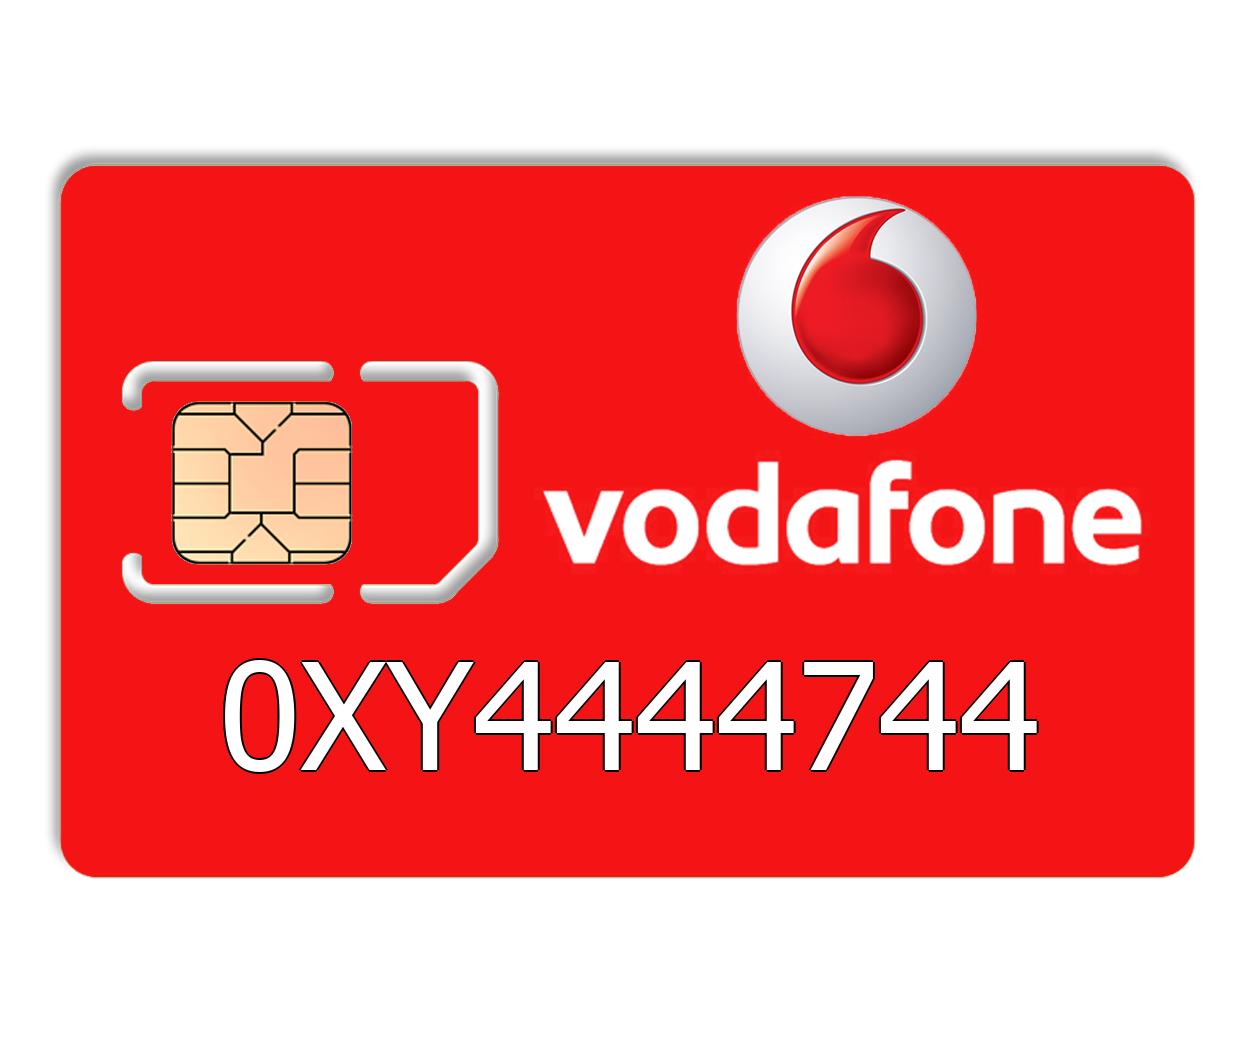 Красивый номер Vodafone 0XY4444744